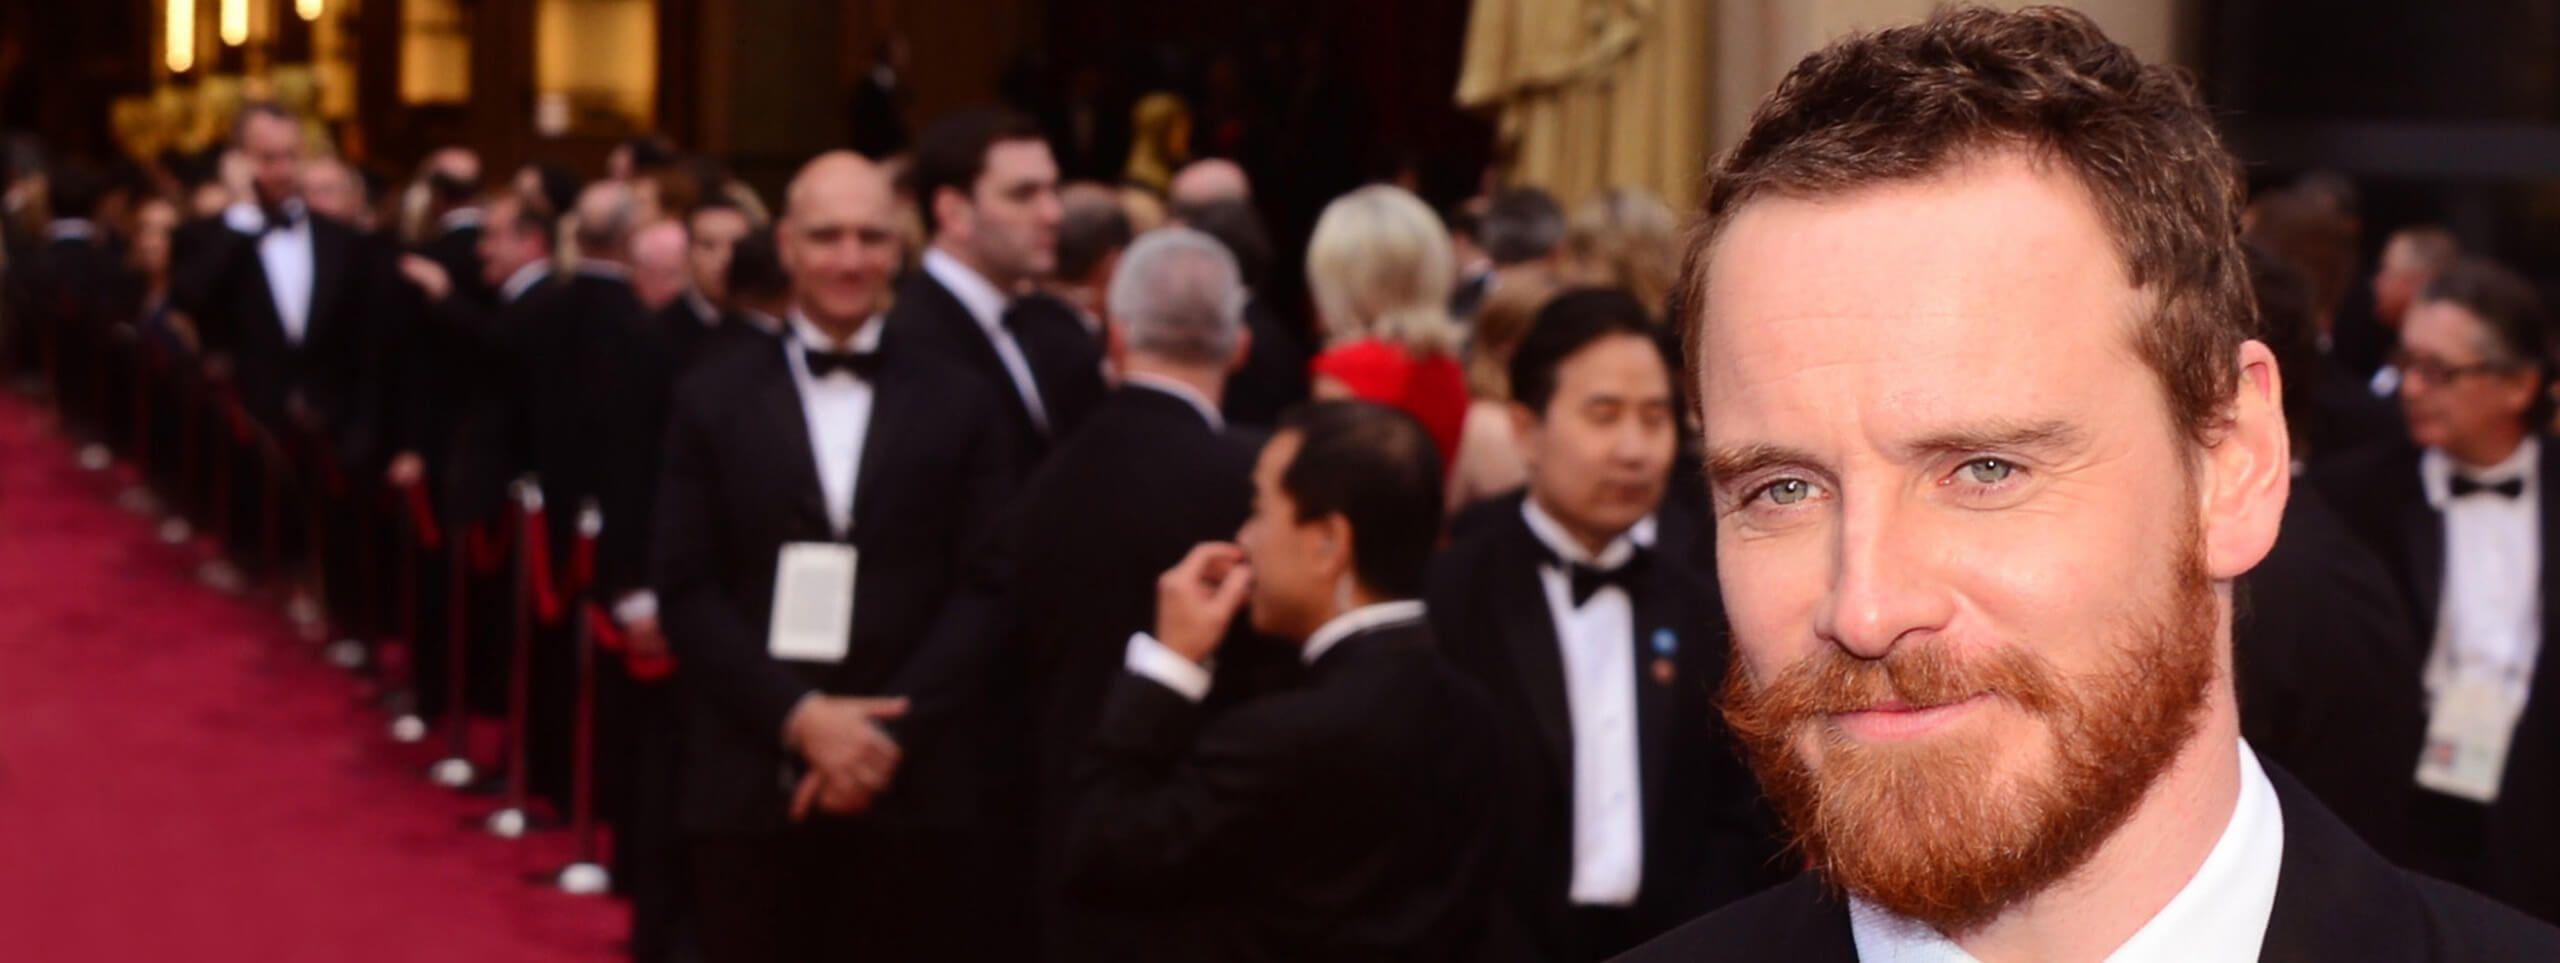 Michael Fassbender pelirrojo con barba